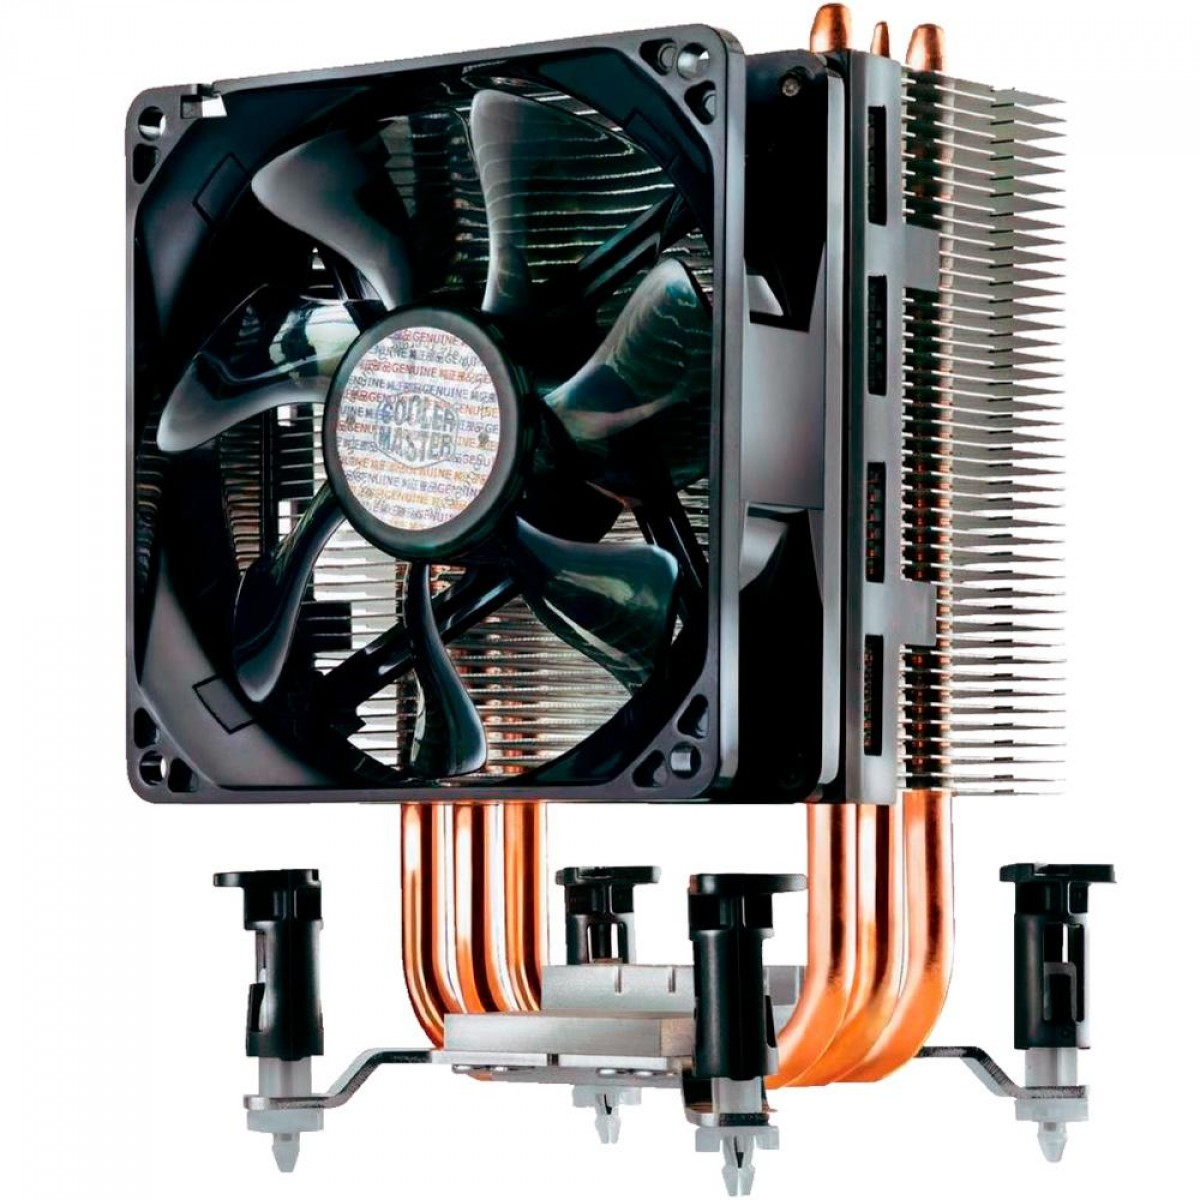 Cooler para Processador Cooler Master Hyper TX3 EVO, 92mm,  Intel-AMD, RR-TX3E-28PK-R1